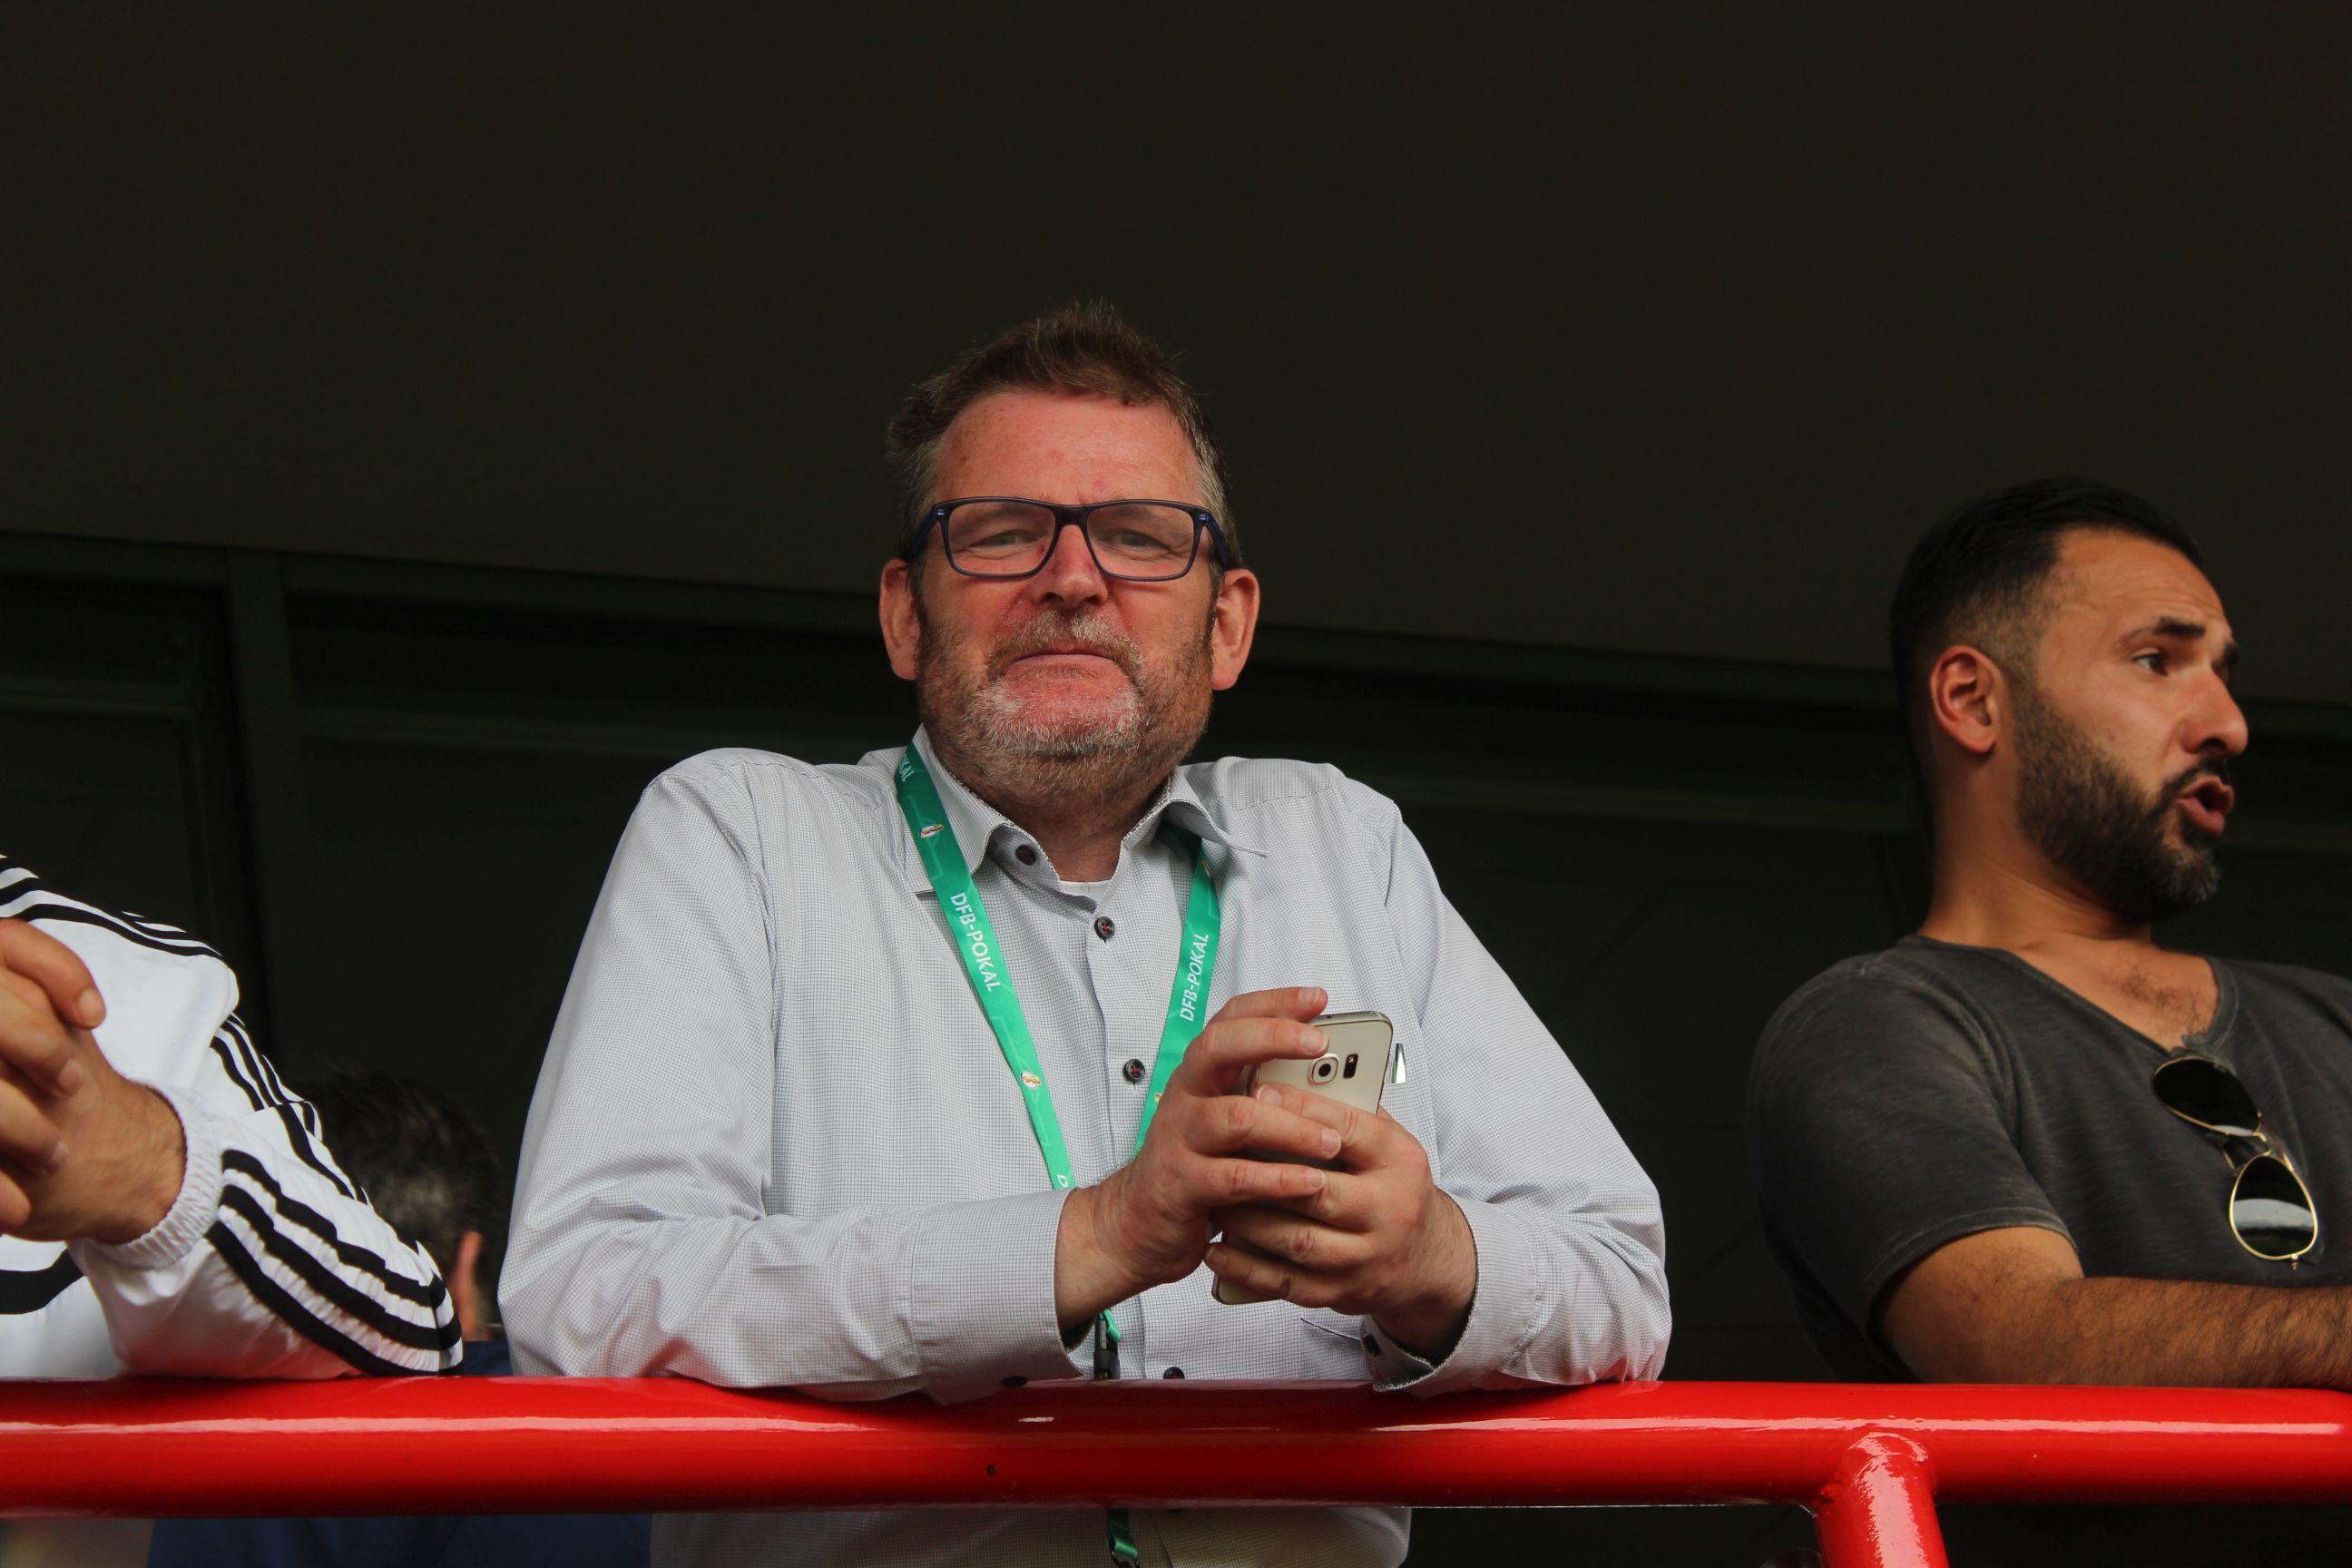 Fred Boettcher, Geschäftsführer BFC Preussen